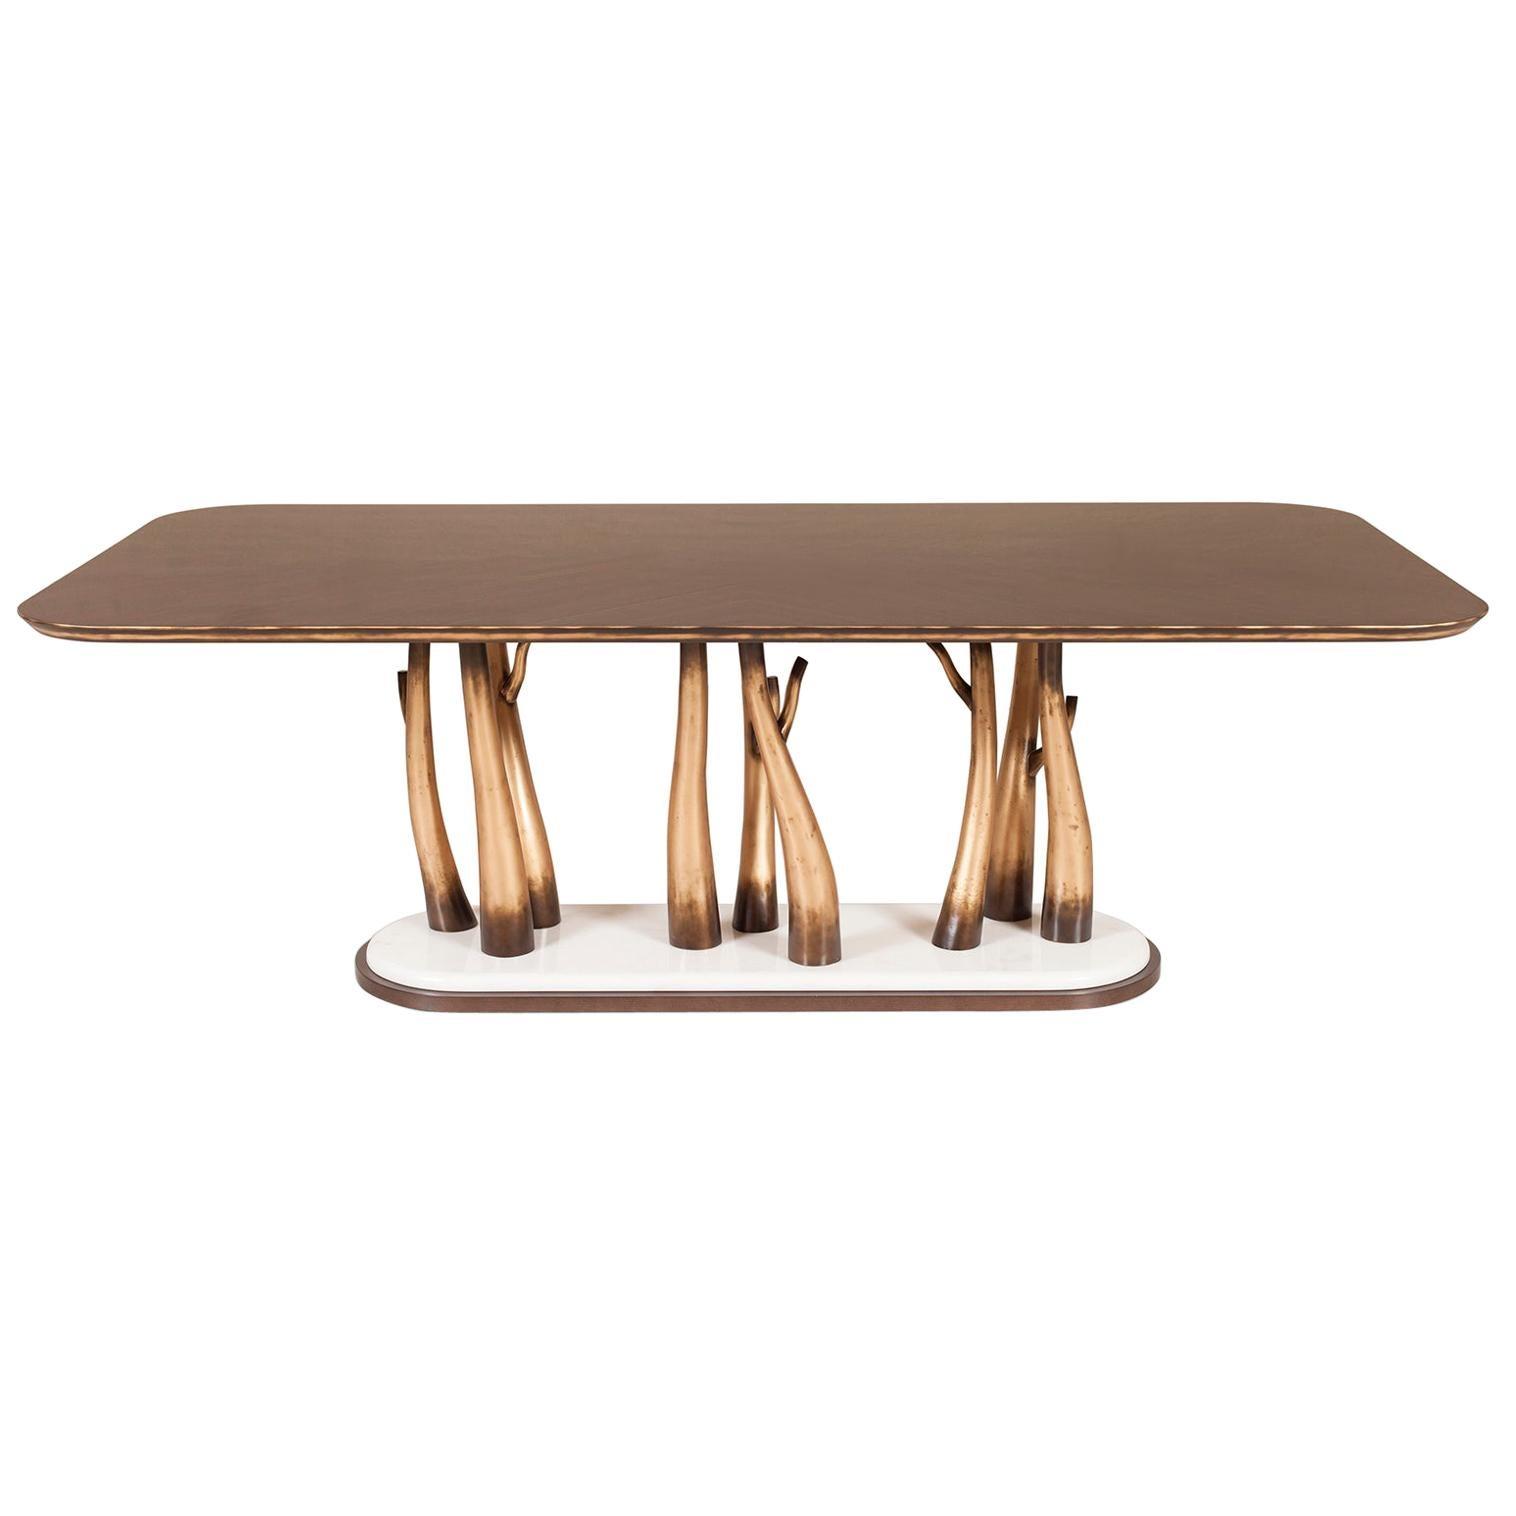 Vallin 8-Seat Dining Table Ebony Macassar Beech Calacatta Bianco Rustic Gold